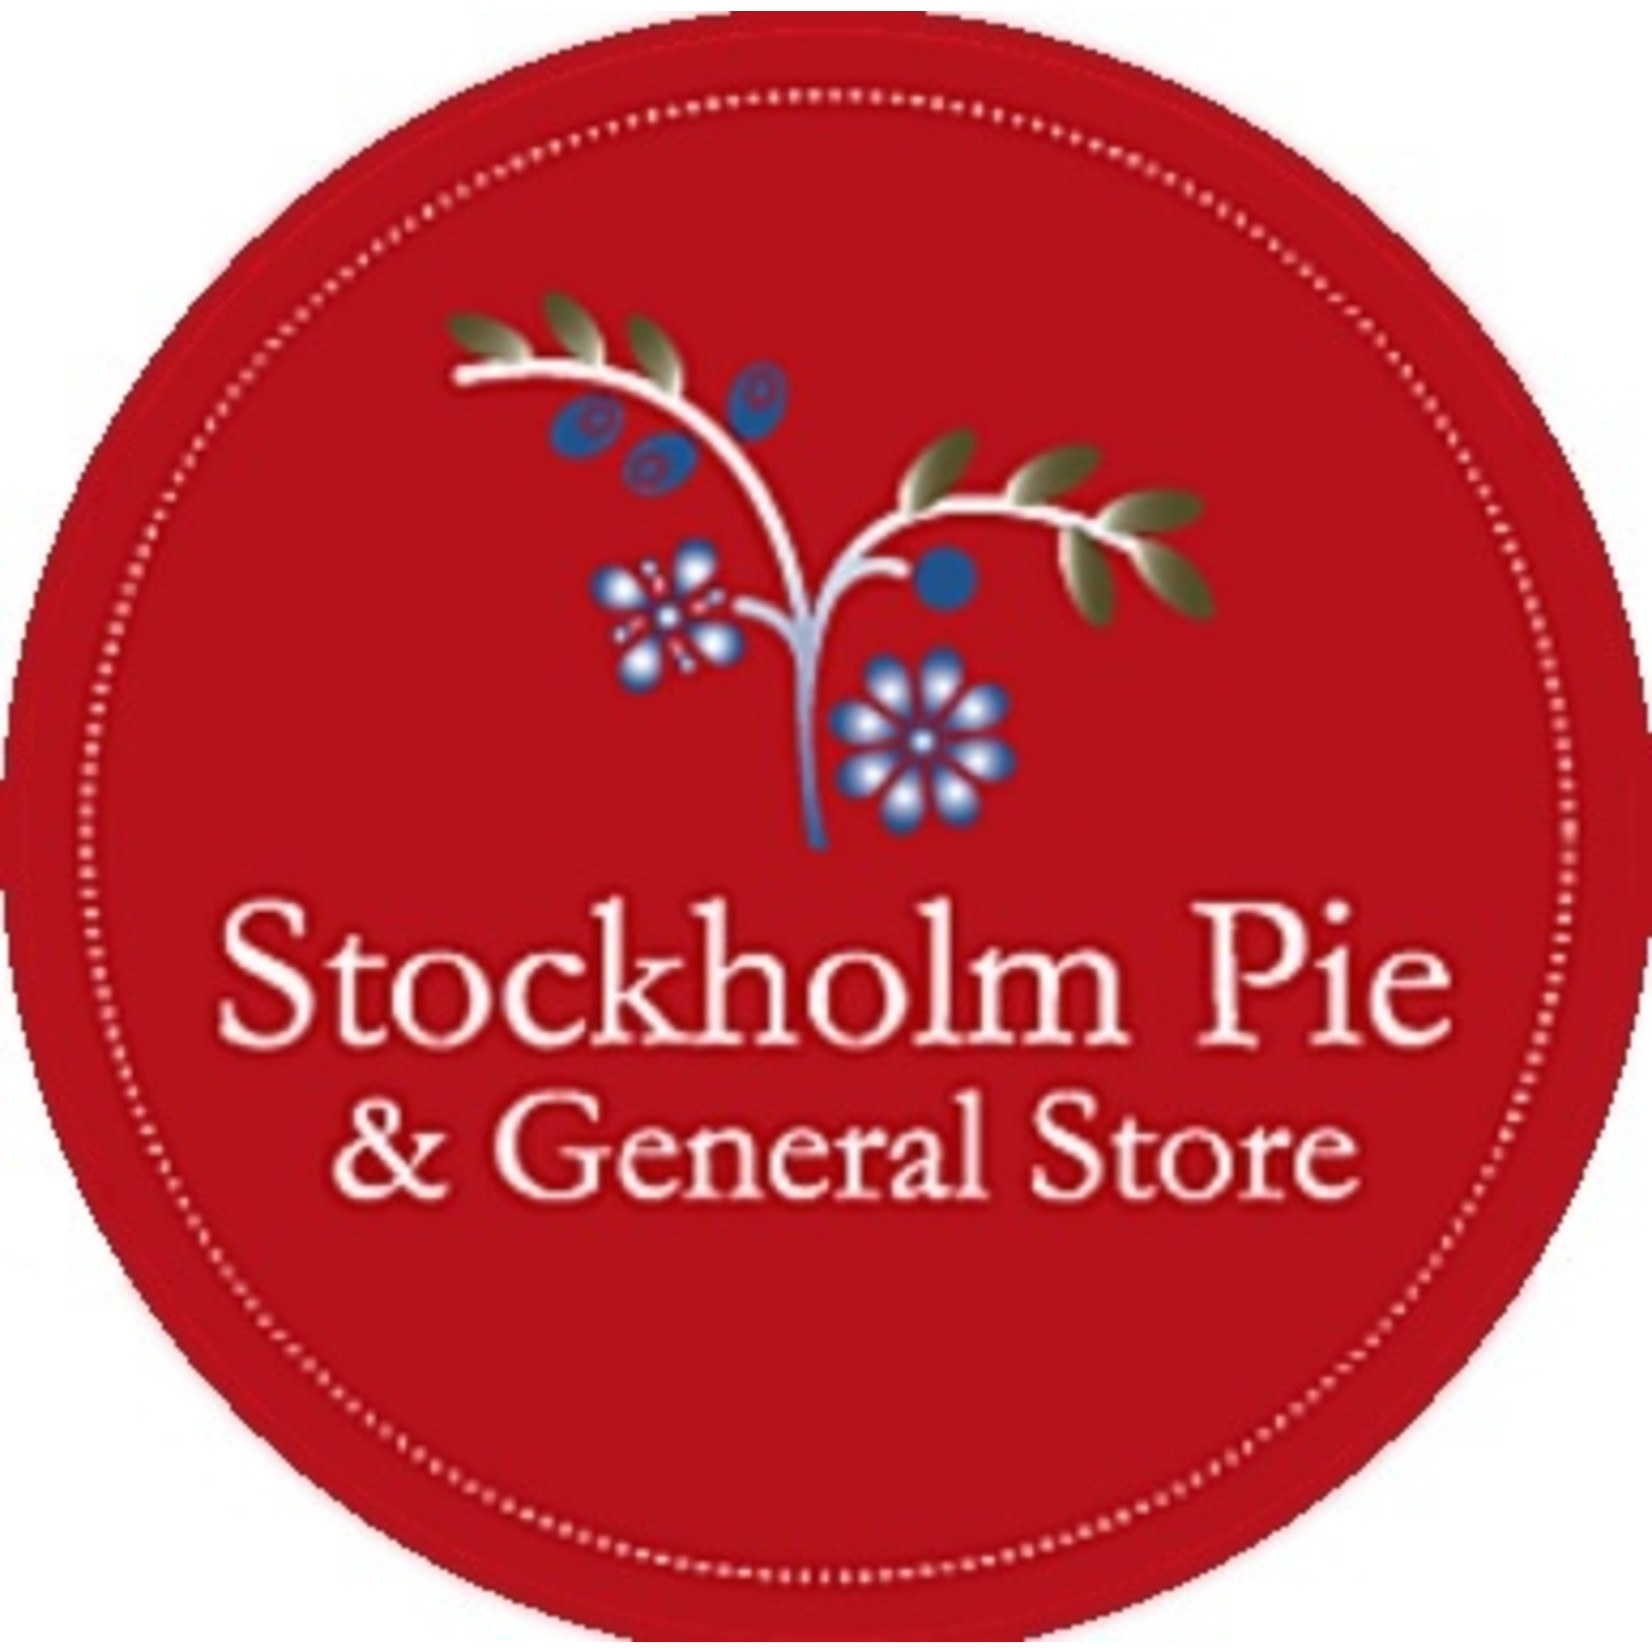 Private Label Stockholm Pie & General Sticker